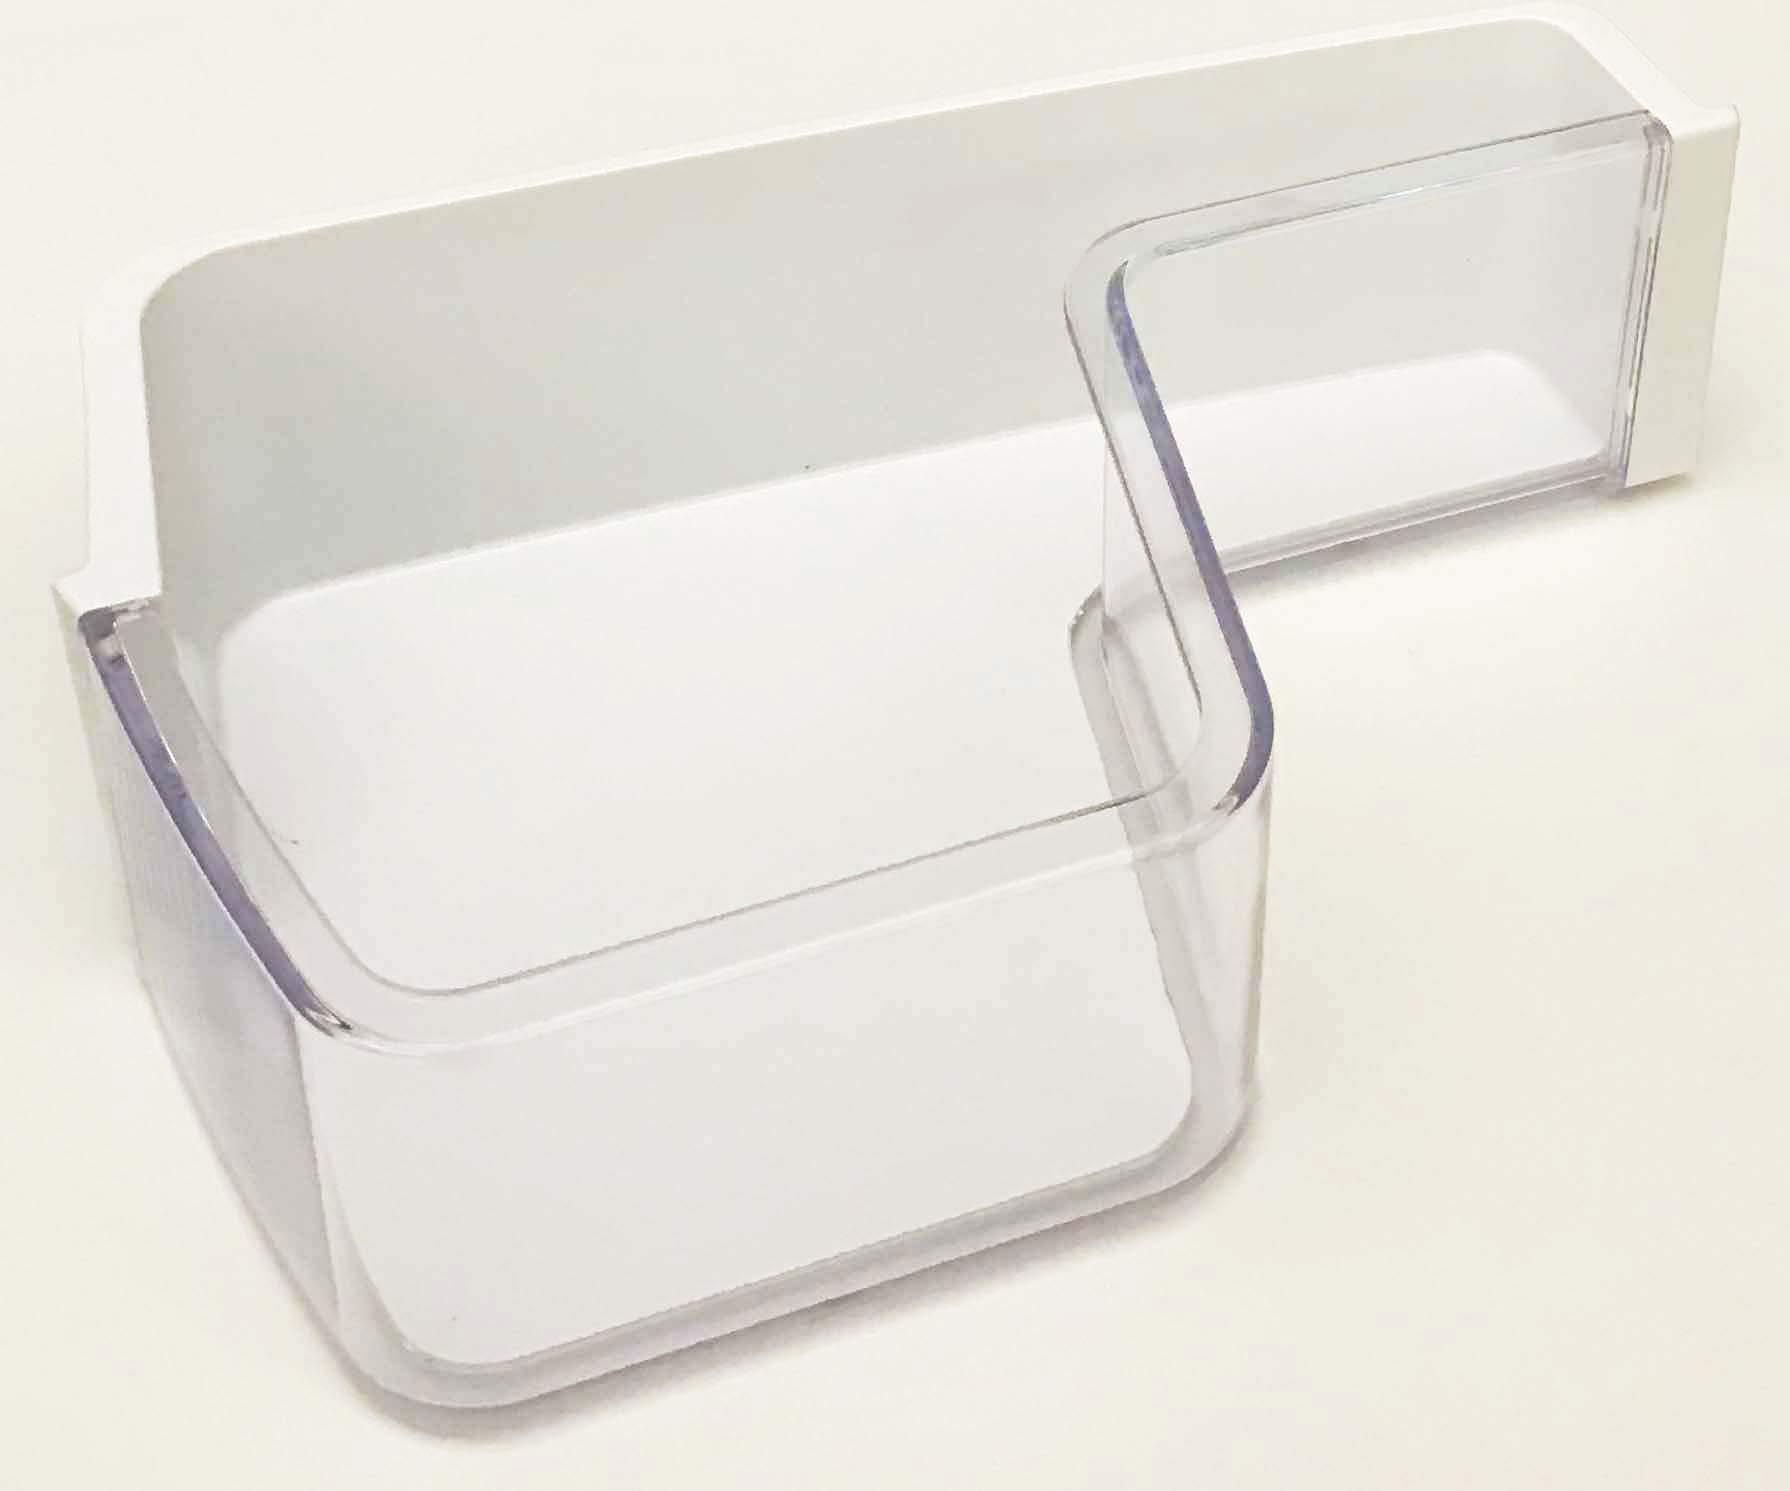 OEM Samsung Refrigerator Door Bin Basket Shelf Tray Specifically For RF263BEAESR, RF263BEAESR/AA, RF263BEAESR/AA (0000) by Samsung